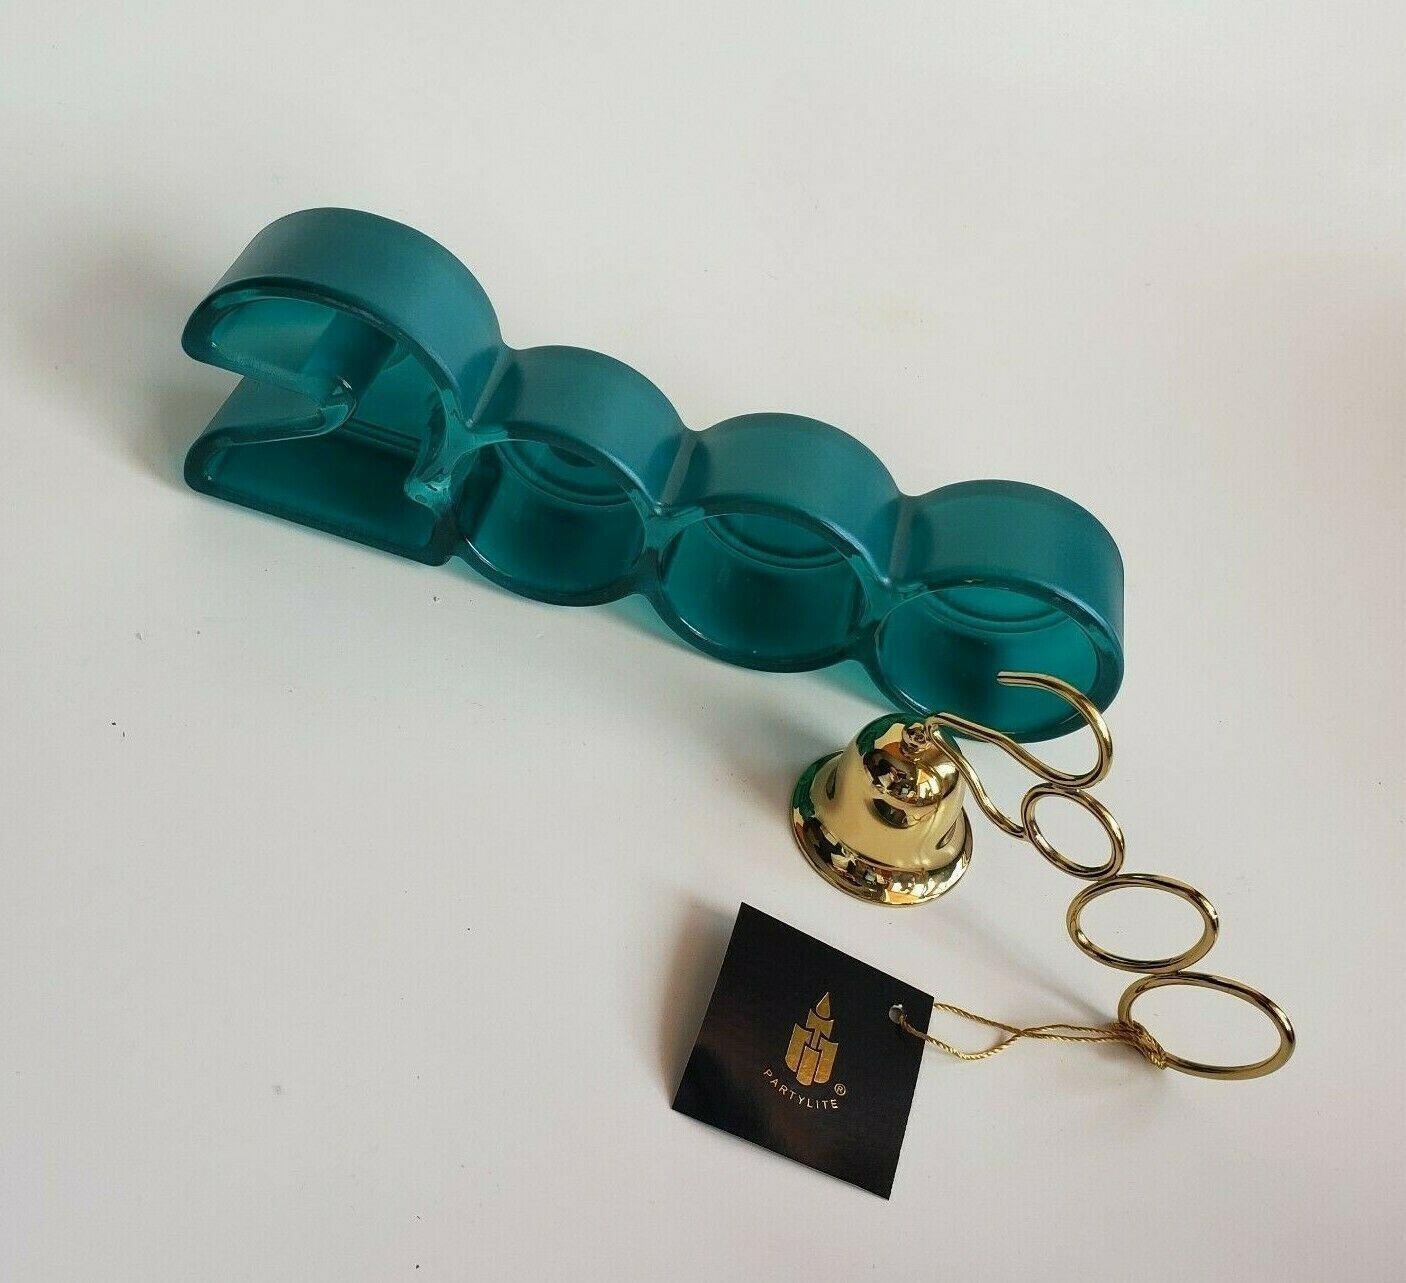 Millennial Year 2000 Teal Glass Tealight Candle Holder Brass Snuffer Partylite